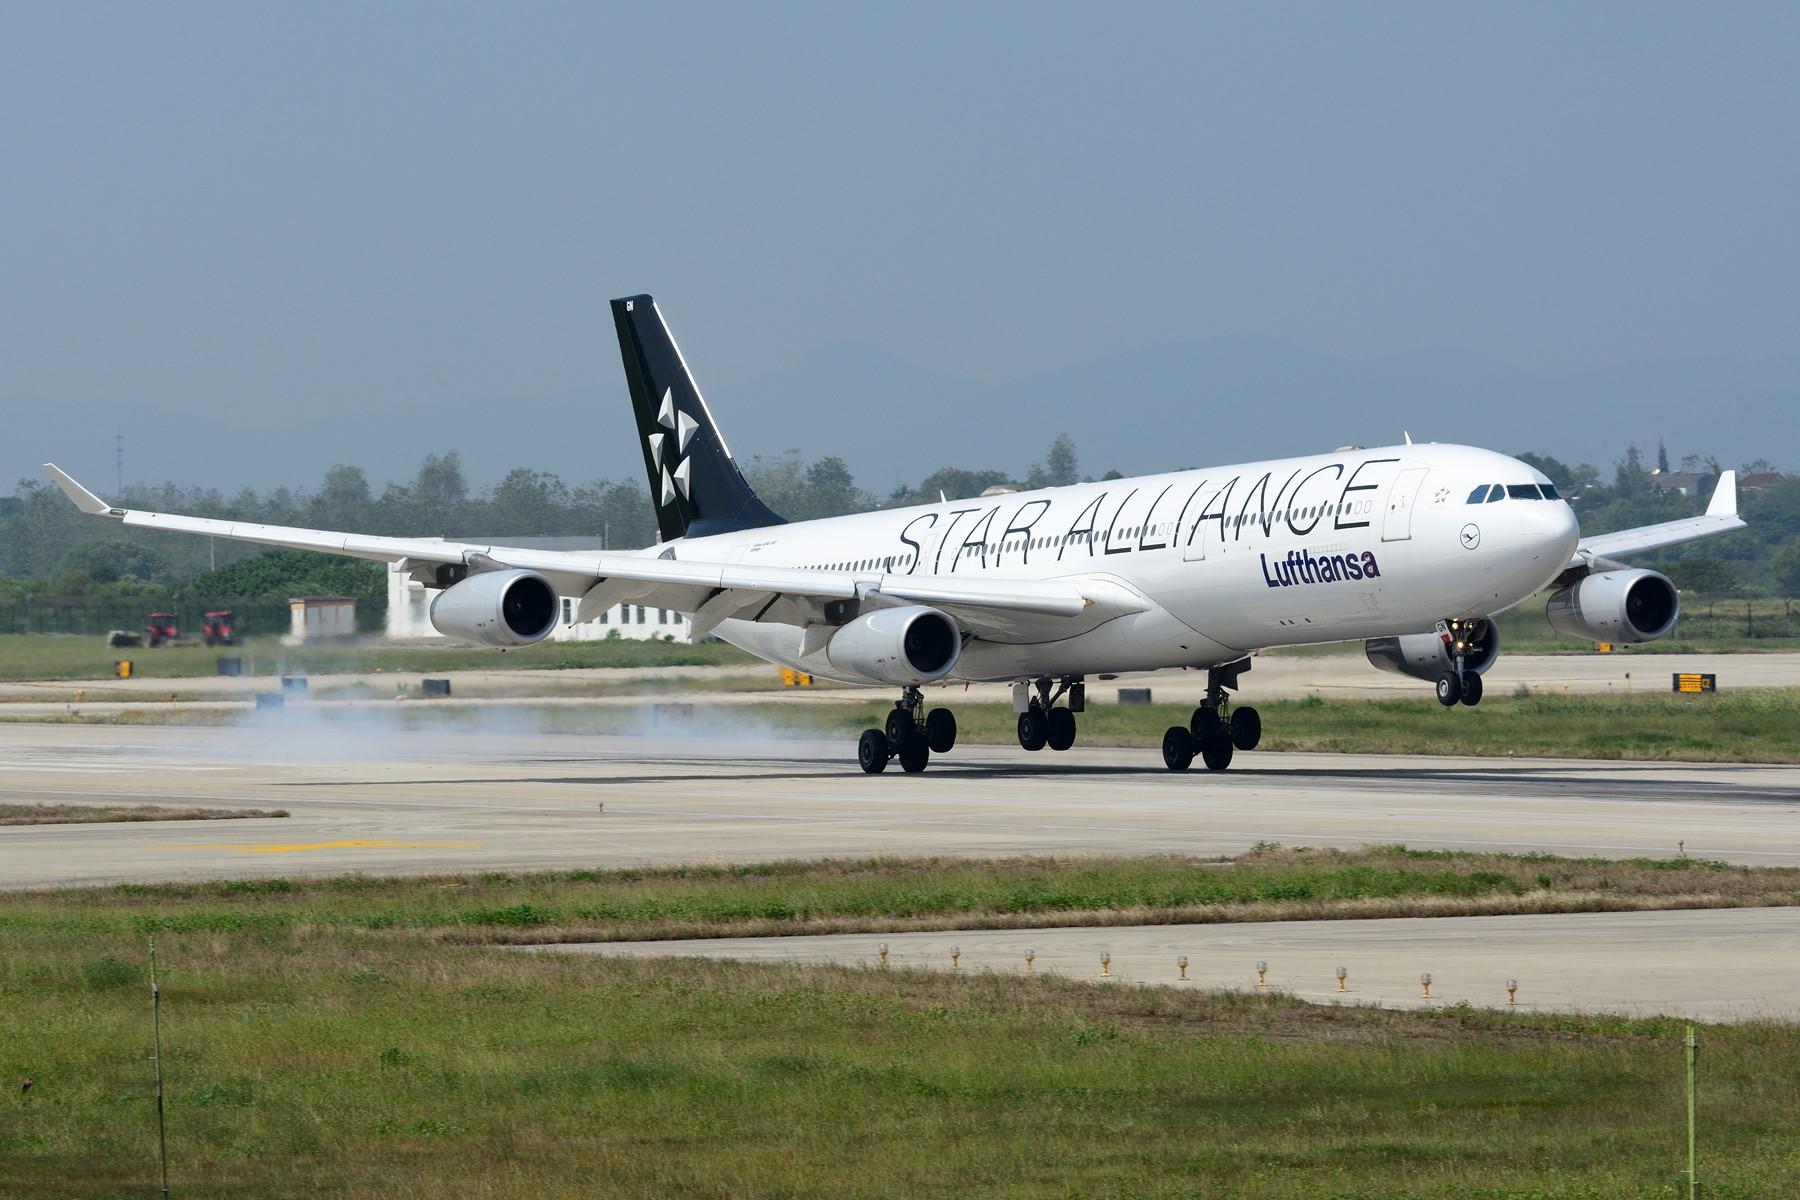 【NKG】初探NKG 07头,结果很给面子地来了两架大猩猩 AIRBUS A340-300 D-AIGN 中国南京禄口国际机场